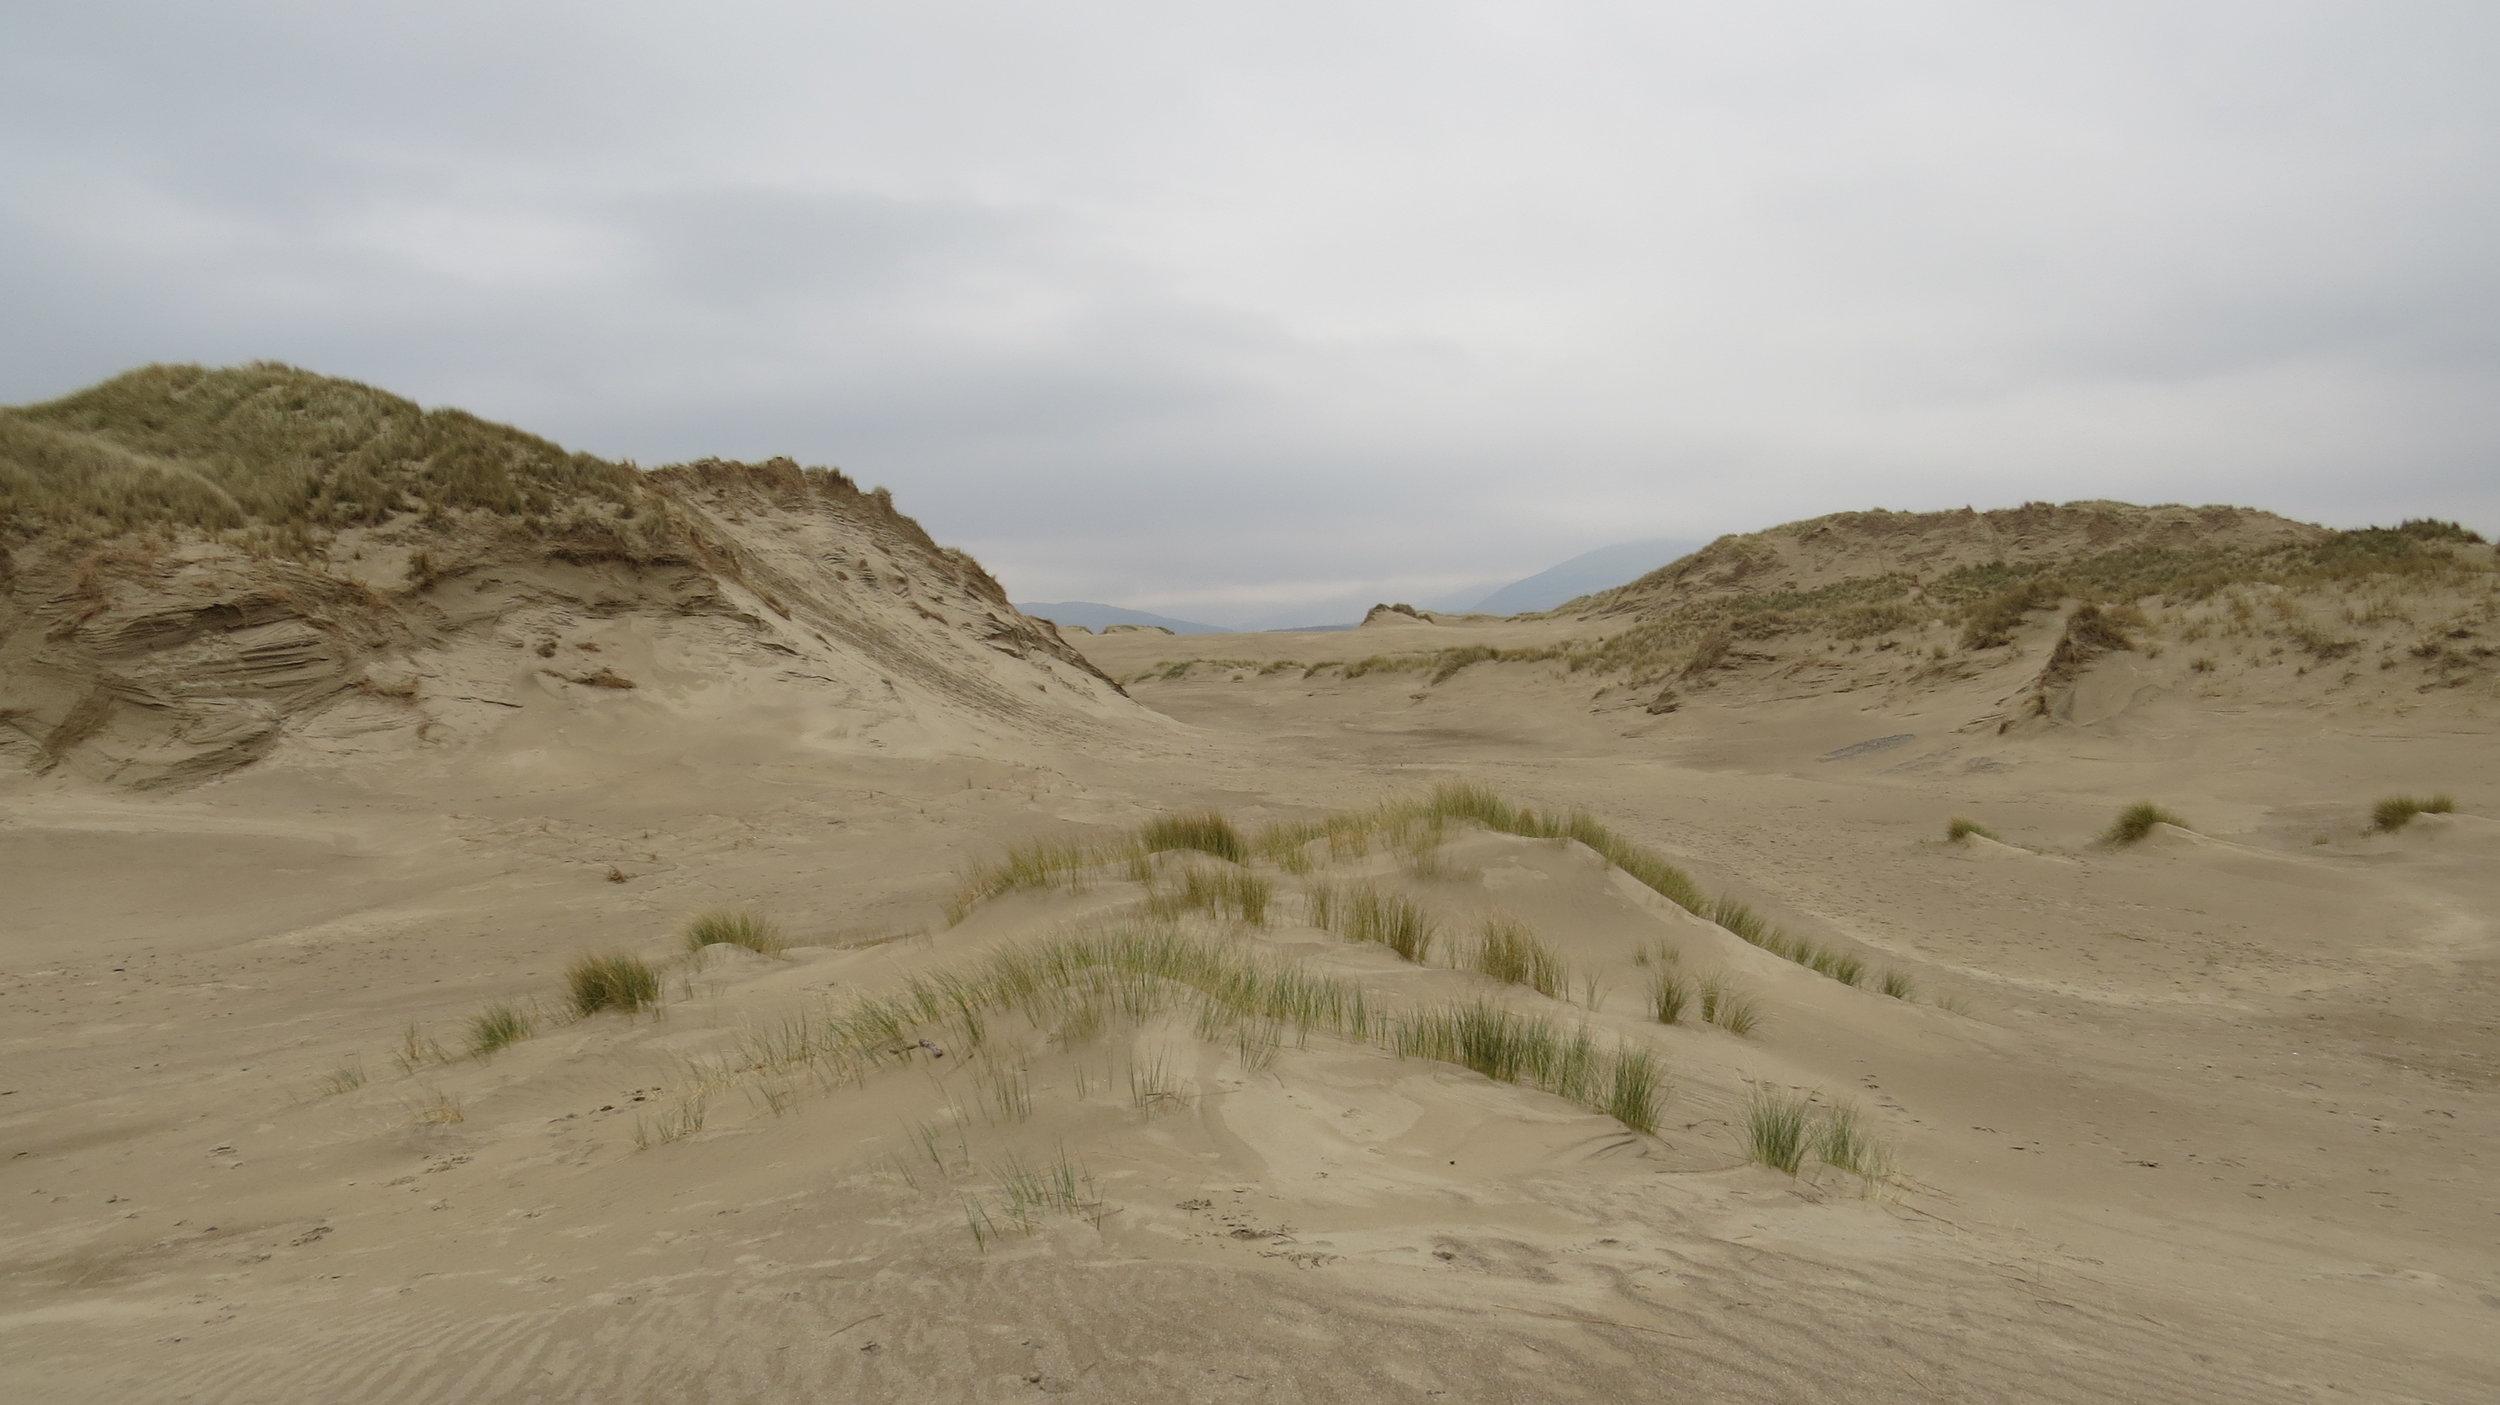 Dunes near Shell Island